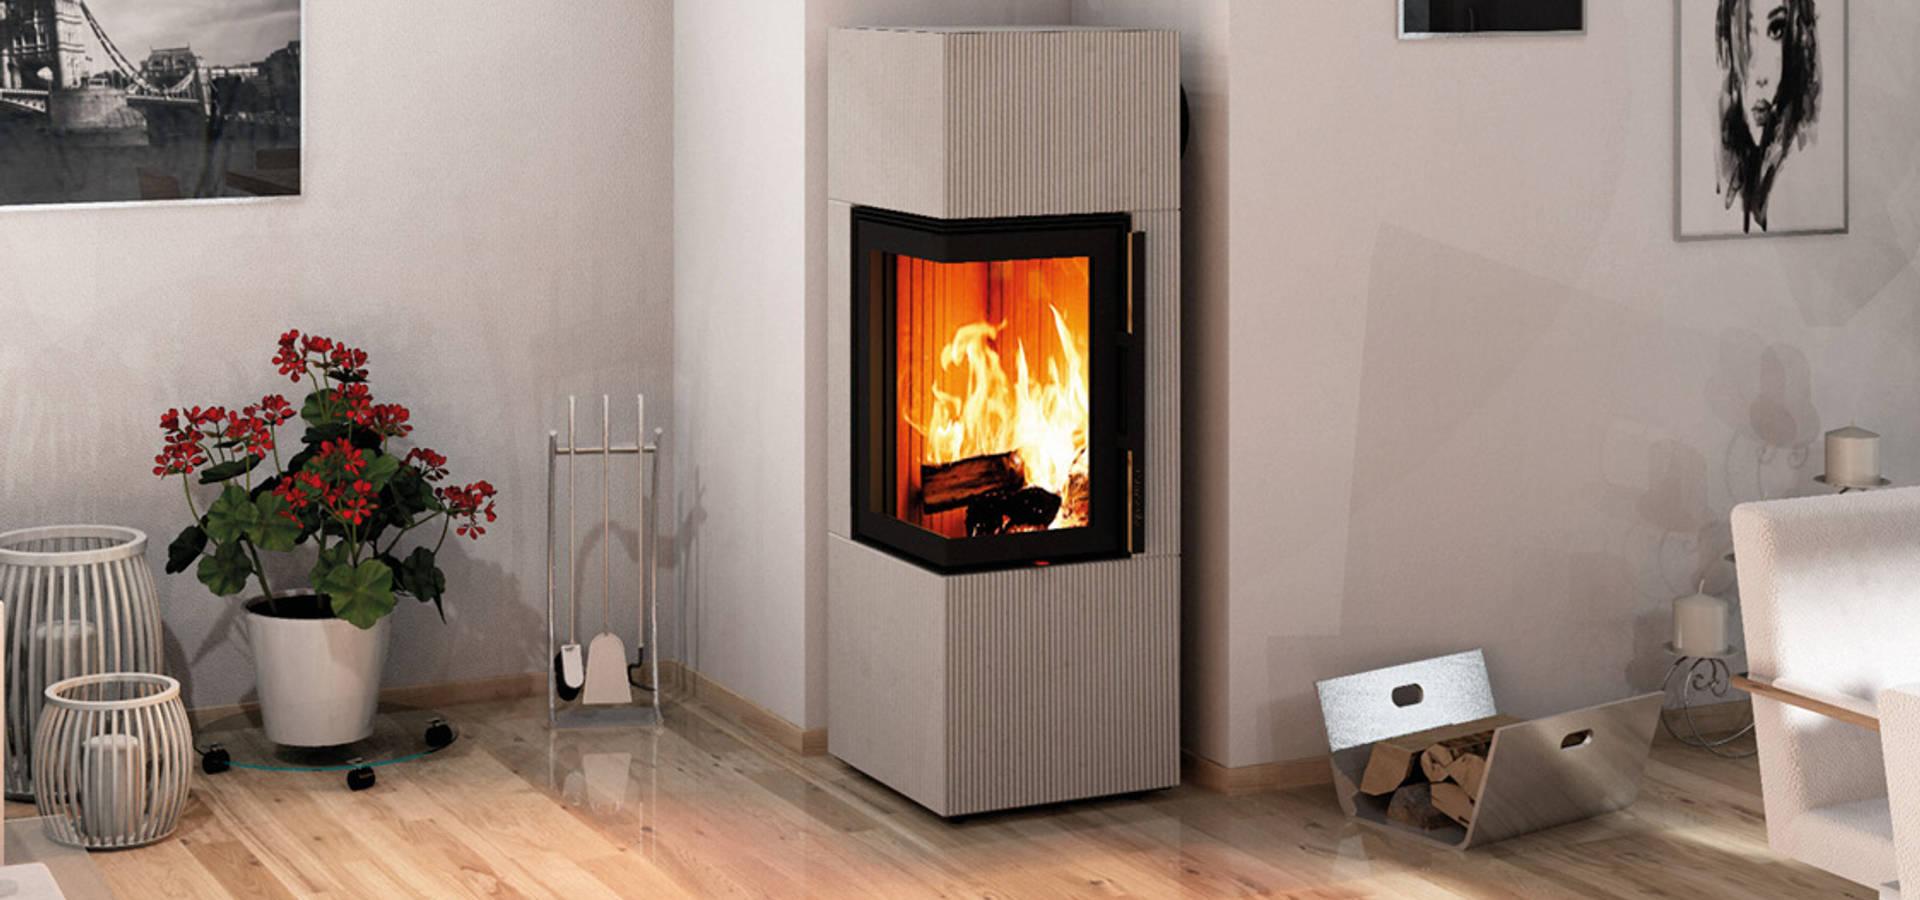 CB stone-tec GmbH